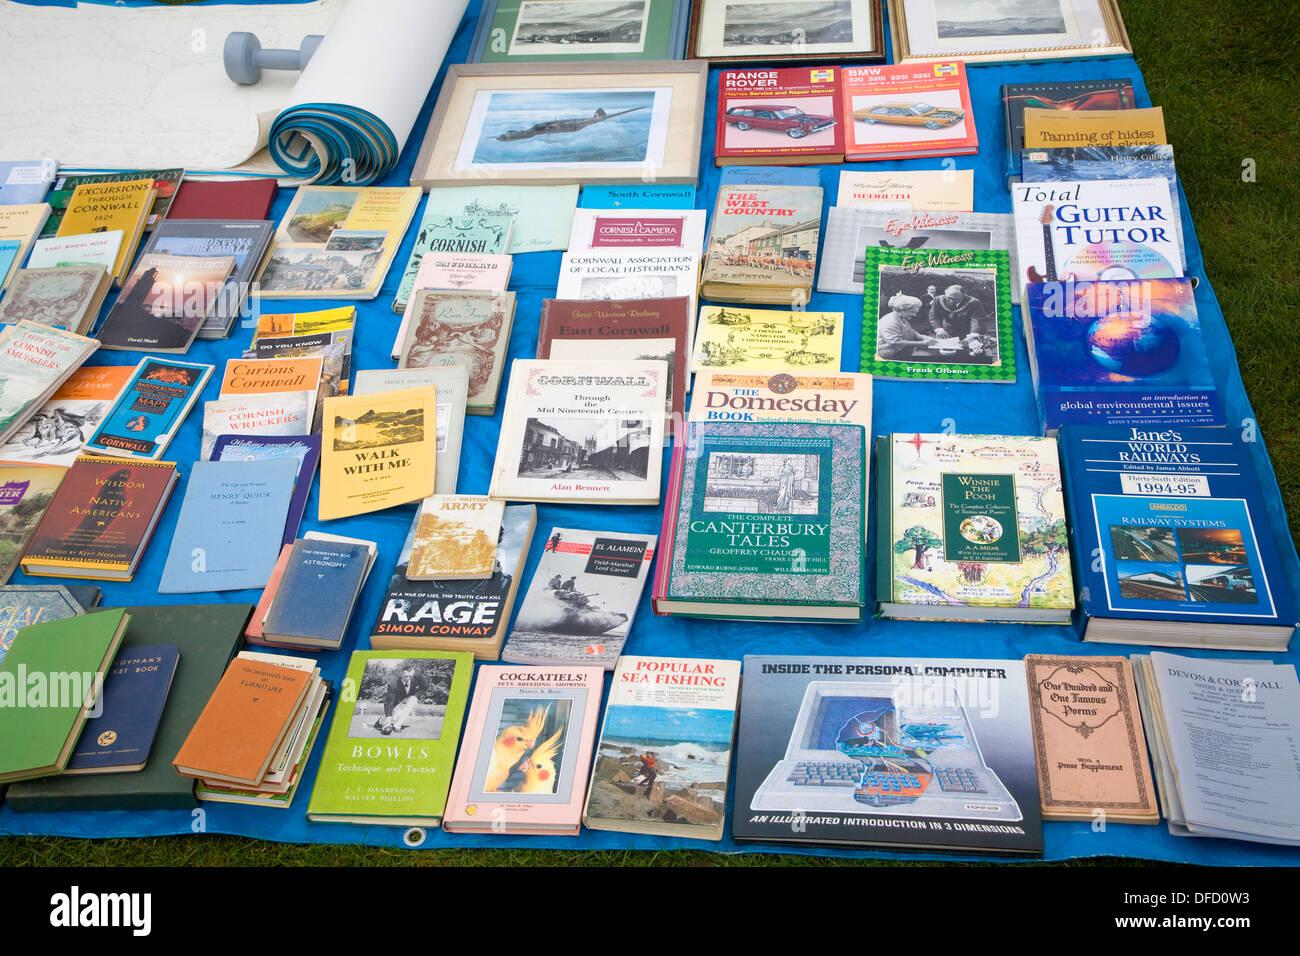 Books on sale car boot sale UK - Stock Image